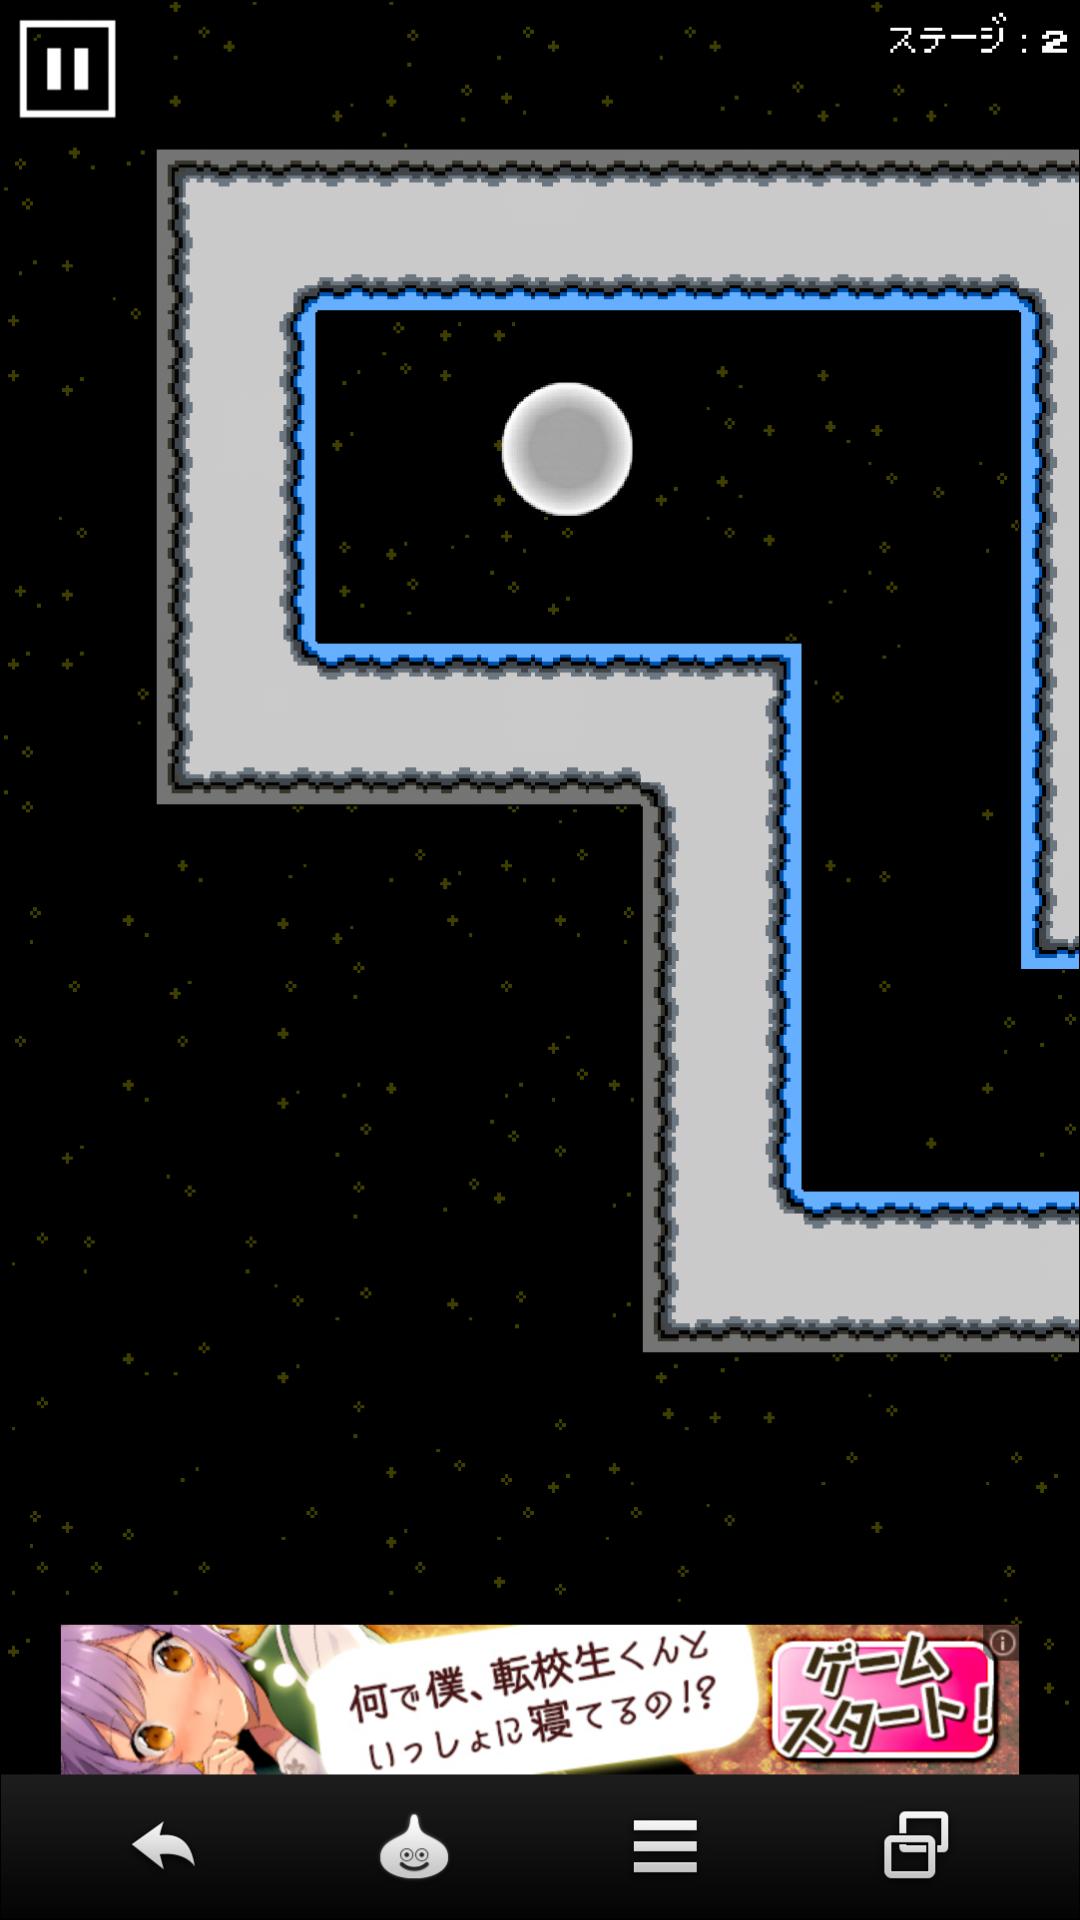 androidアプリ イライラぼう攻略スクリーンショット1